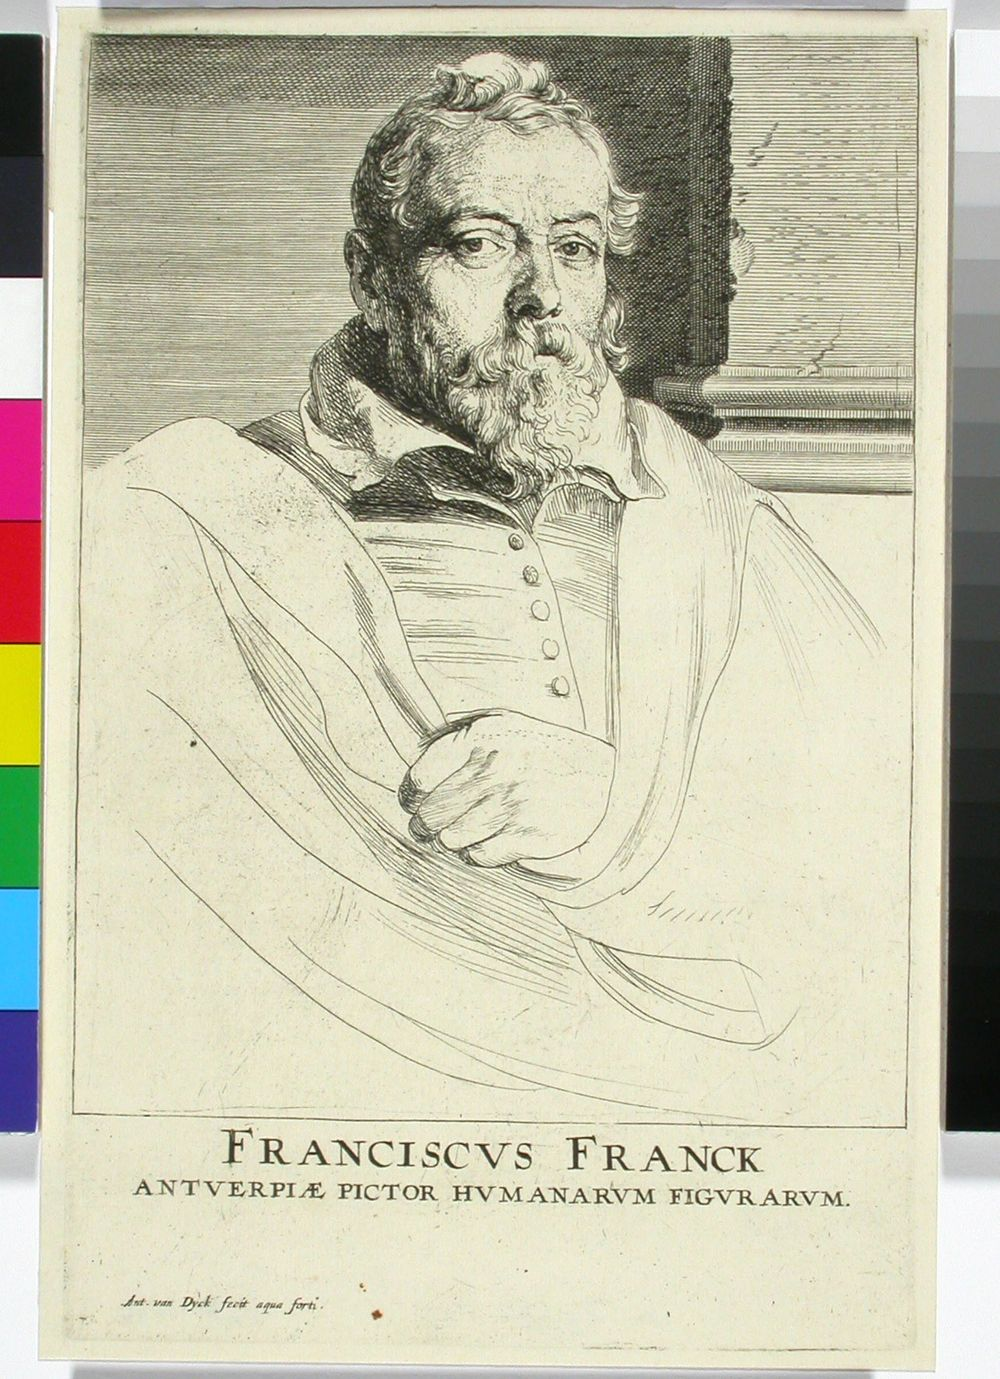 Franciscus Franck